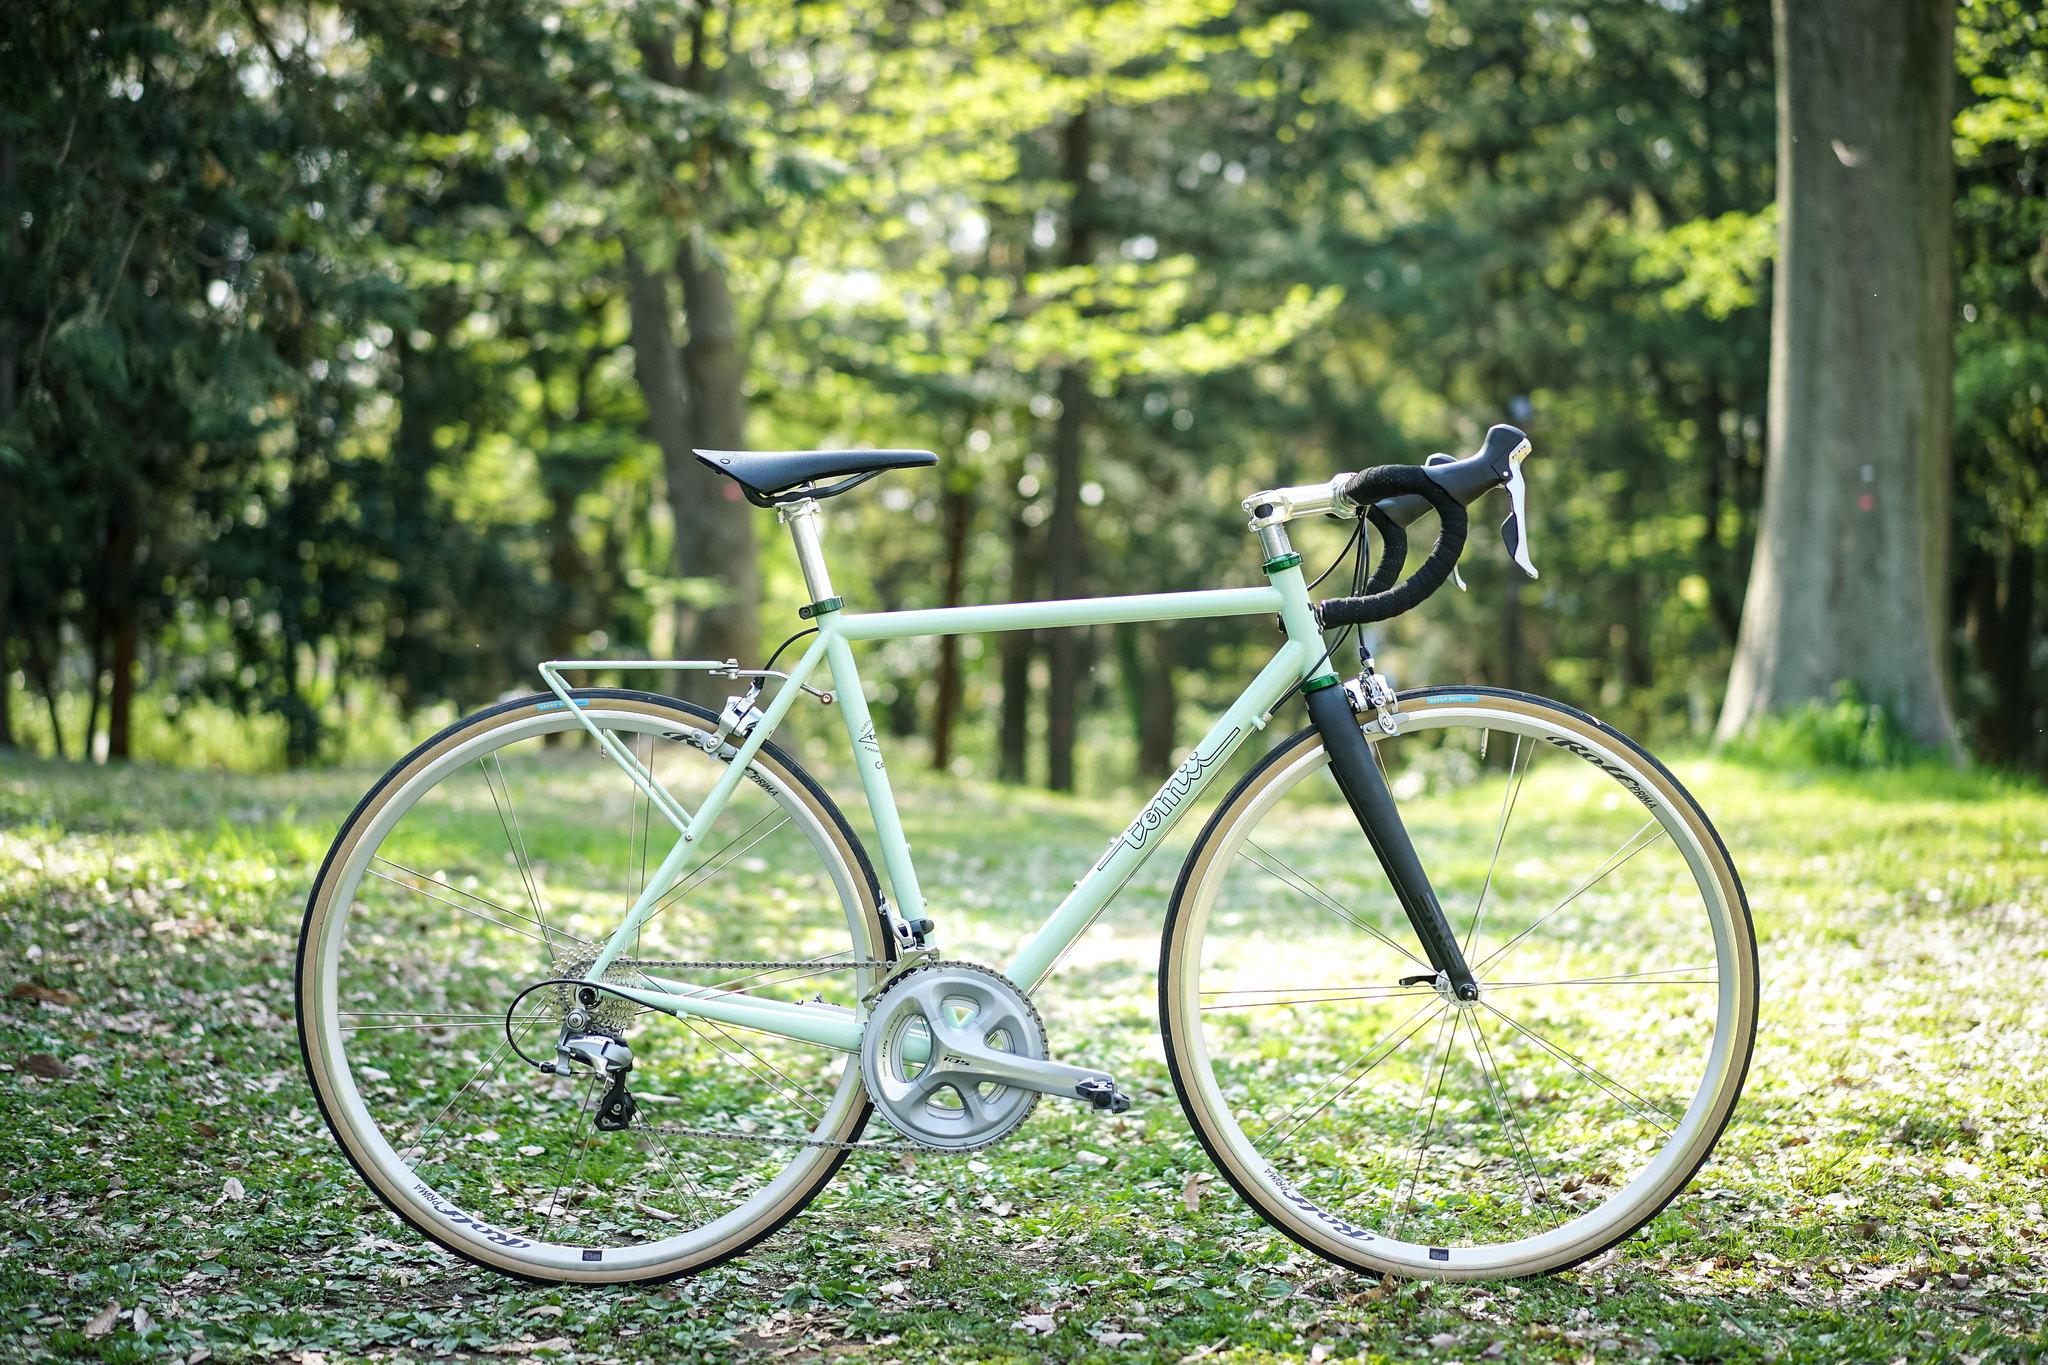 Matsu's *TOMII CYCLES* canvas completebike